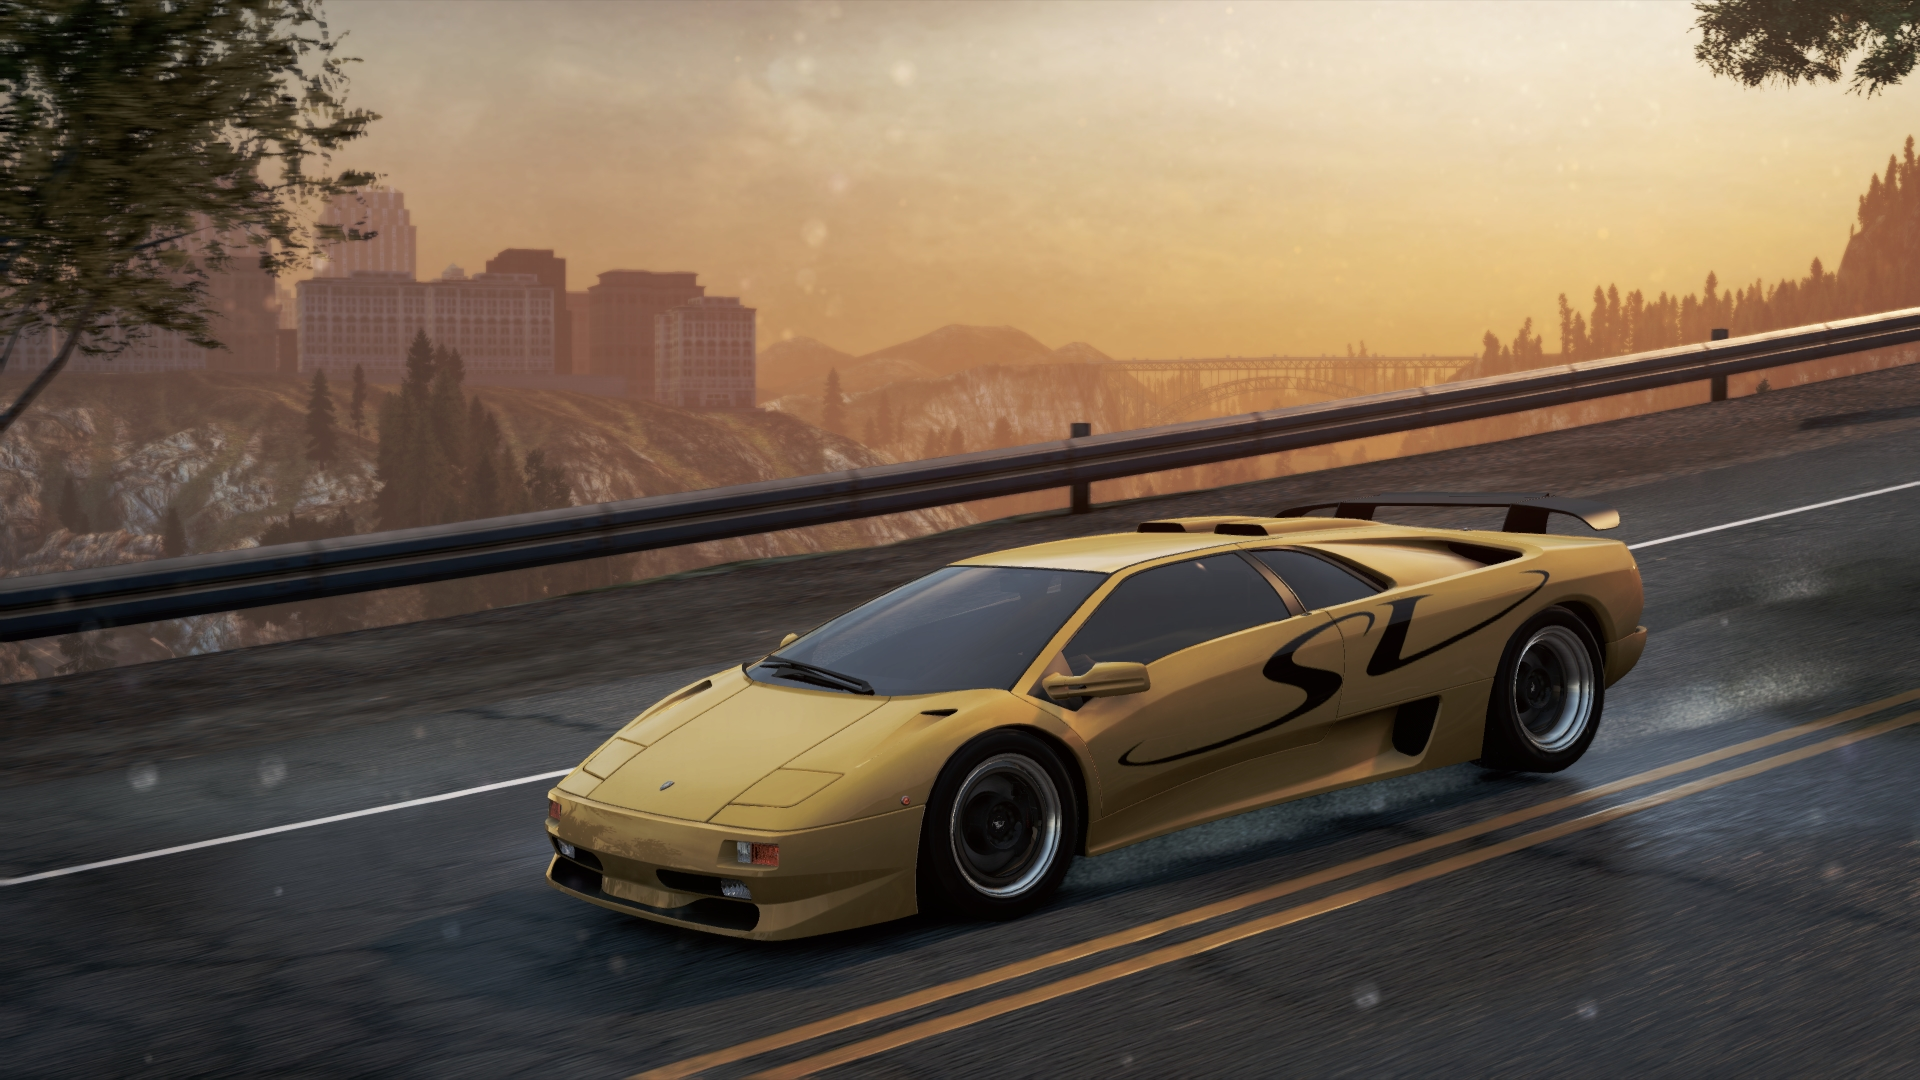 Lamborghini Diablo Sv Need For Speed Wiki Fandom Powered By Wikia